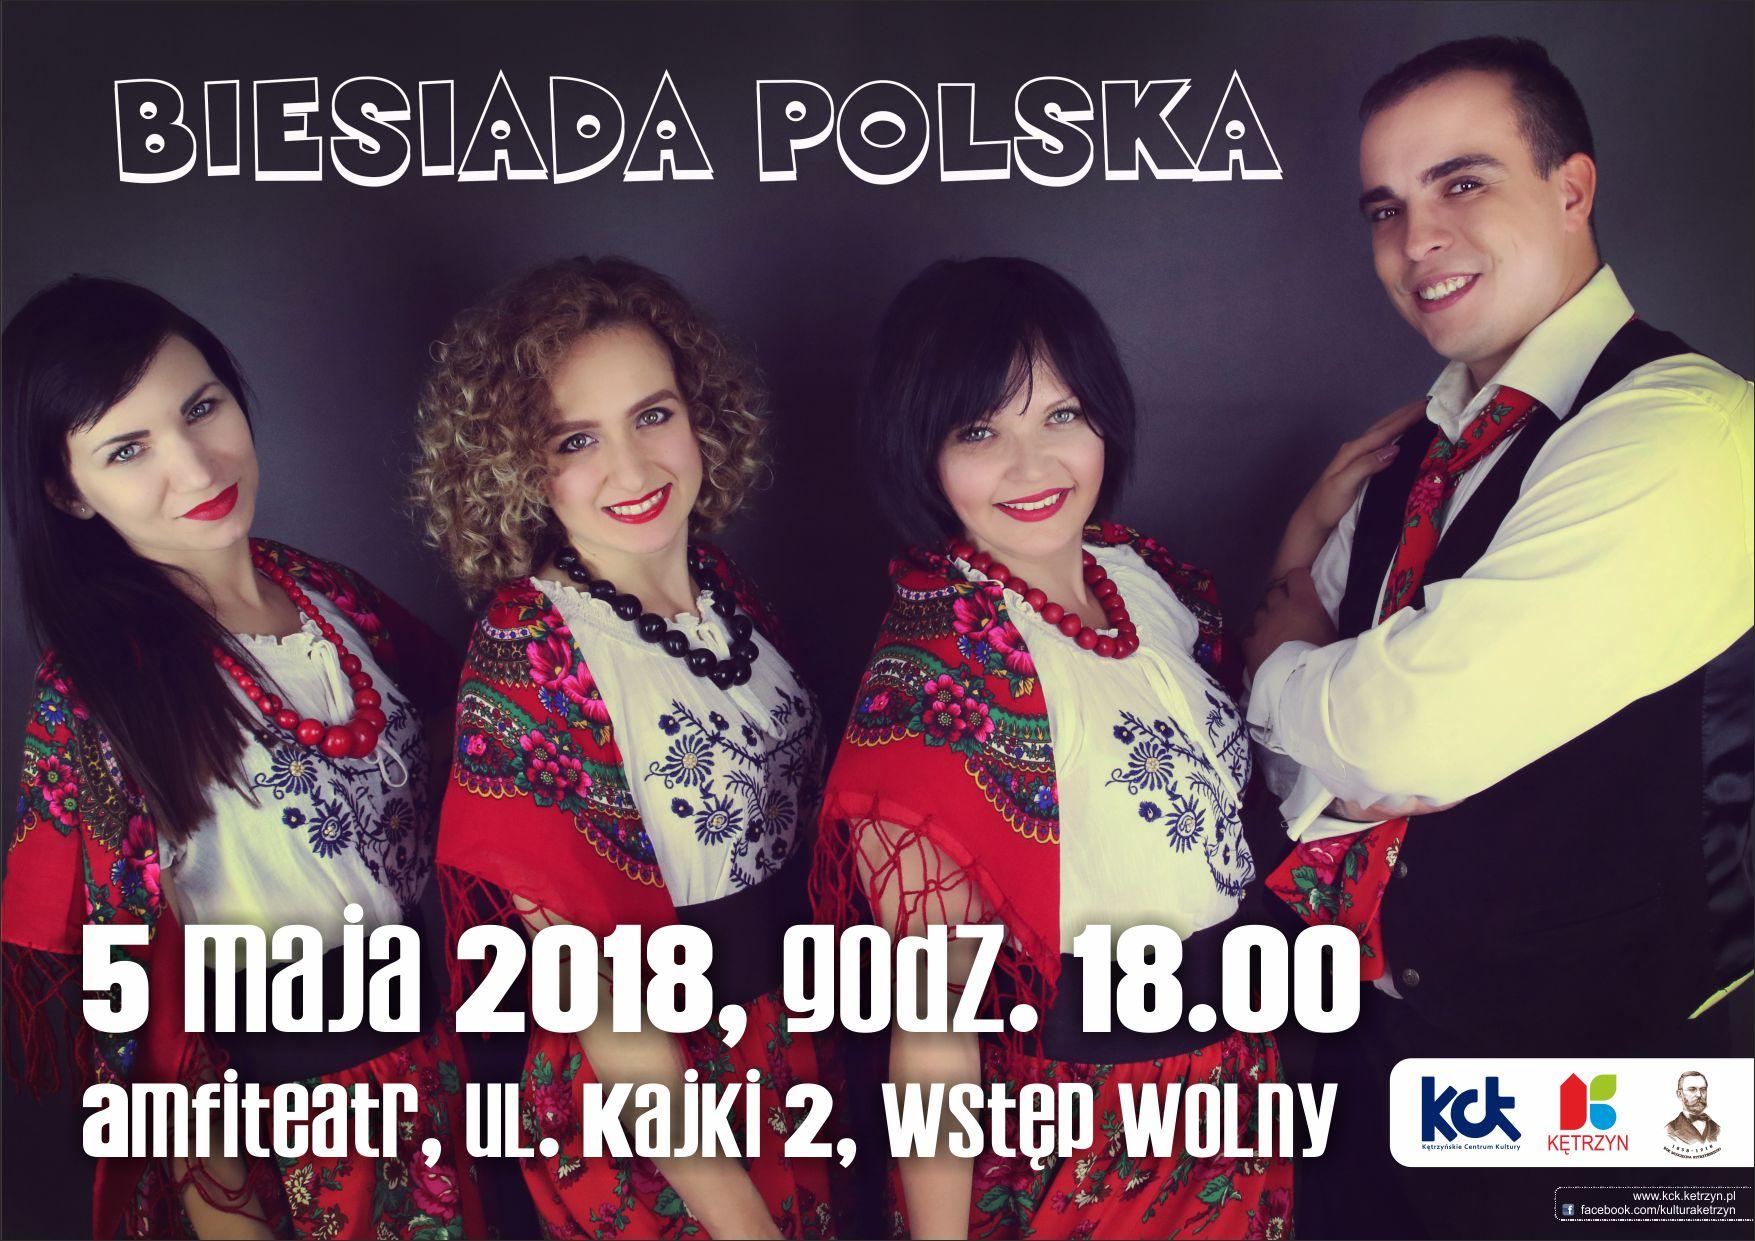 http://m.wm.pl/2018/04/orig/biesiada-polska-461018.jpg